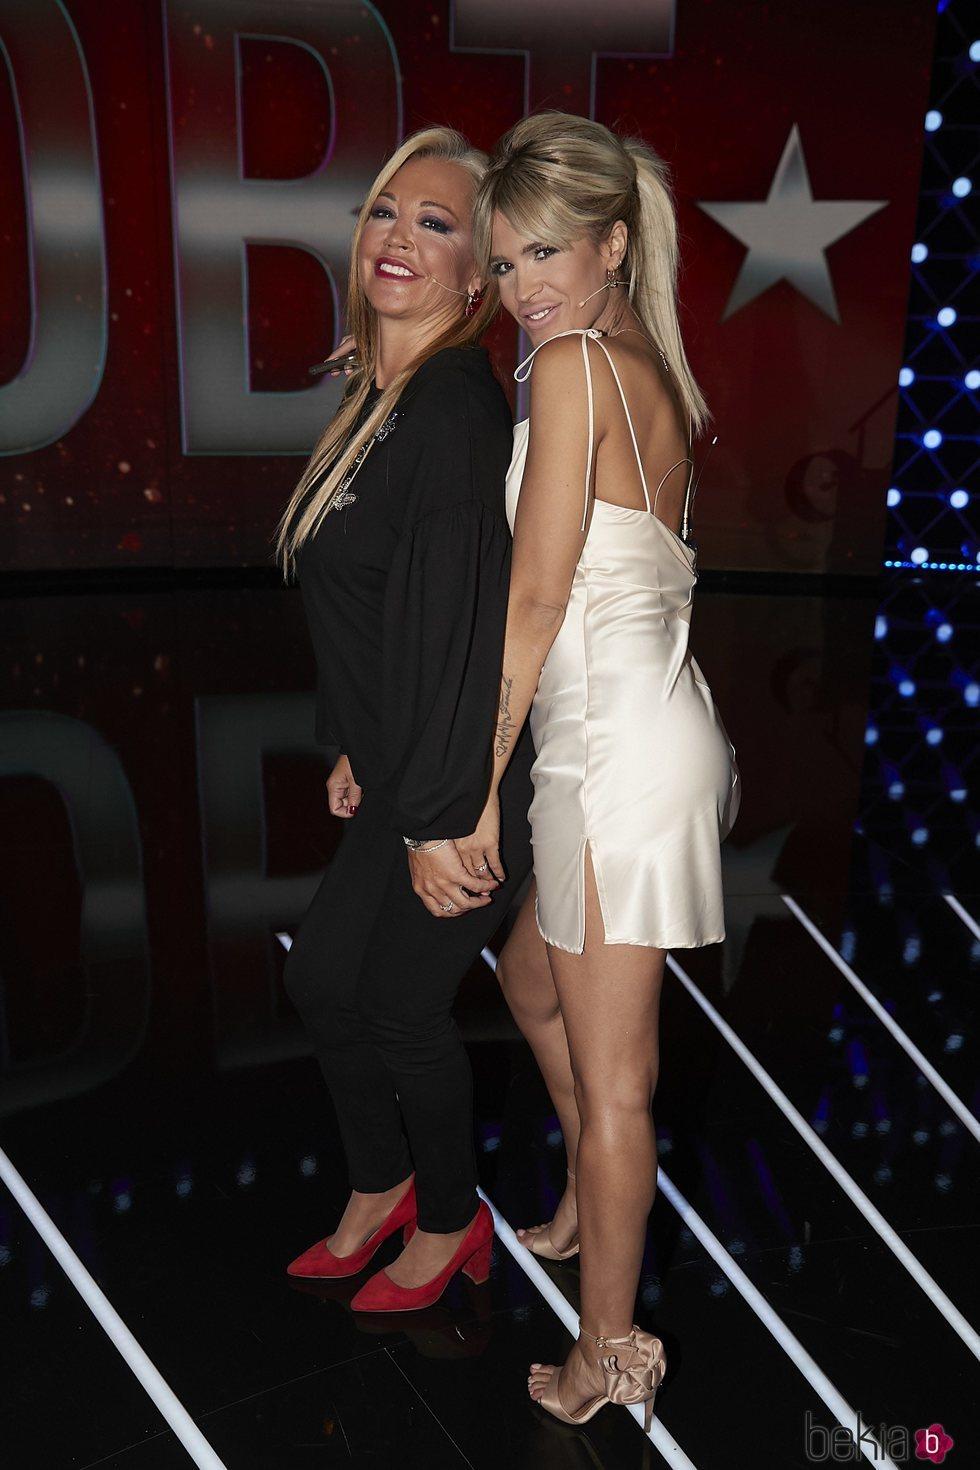 Belén Esteban e Ylenia Padilla en el tercer debate de 'GH VIP 7'